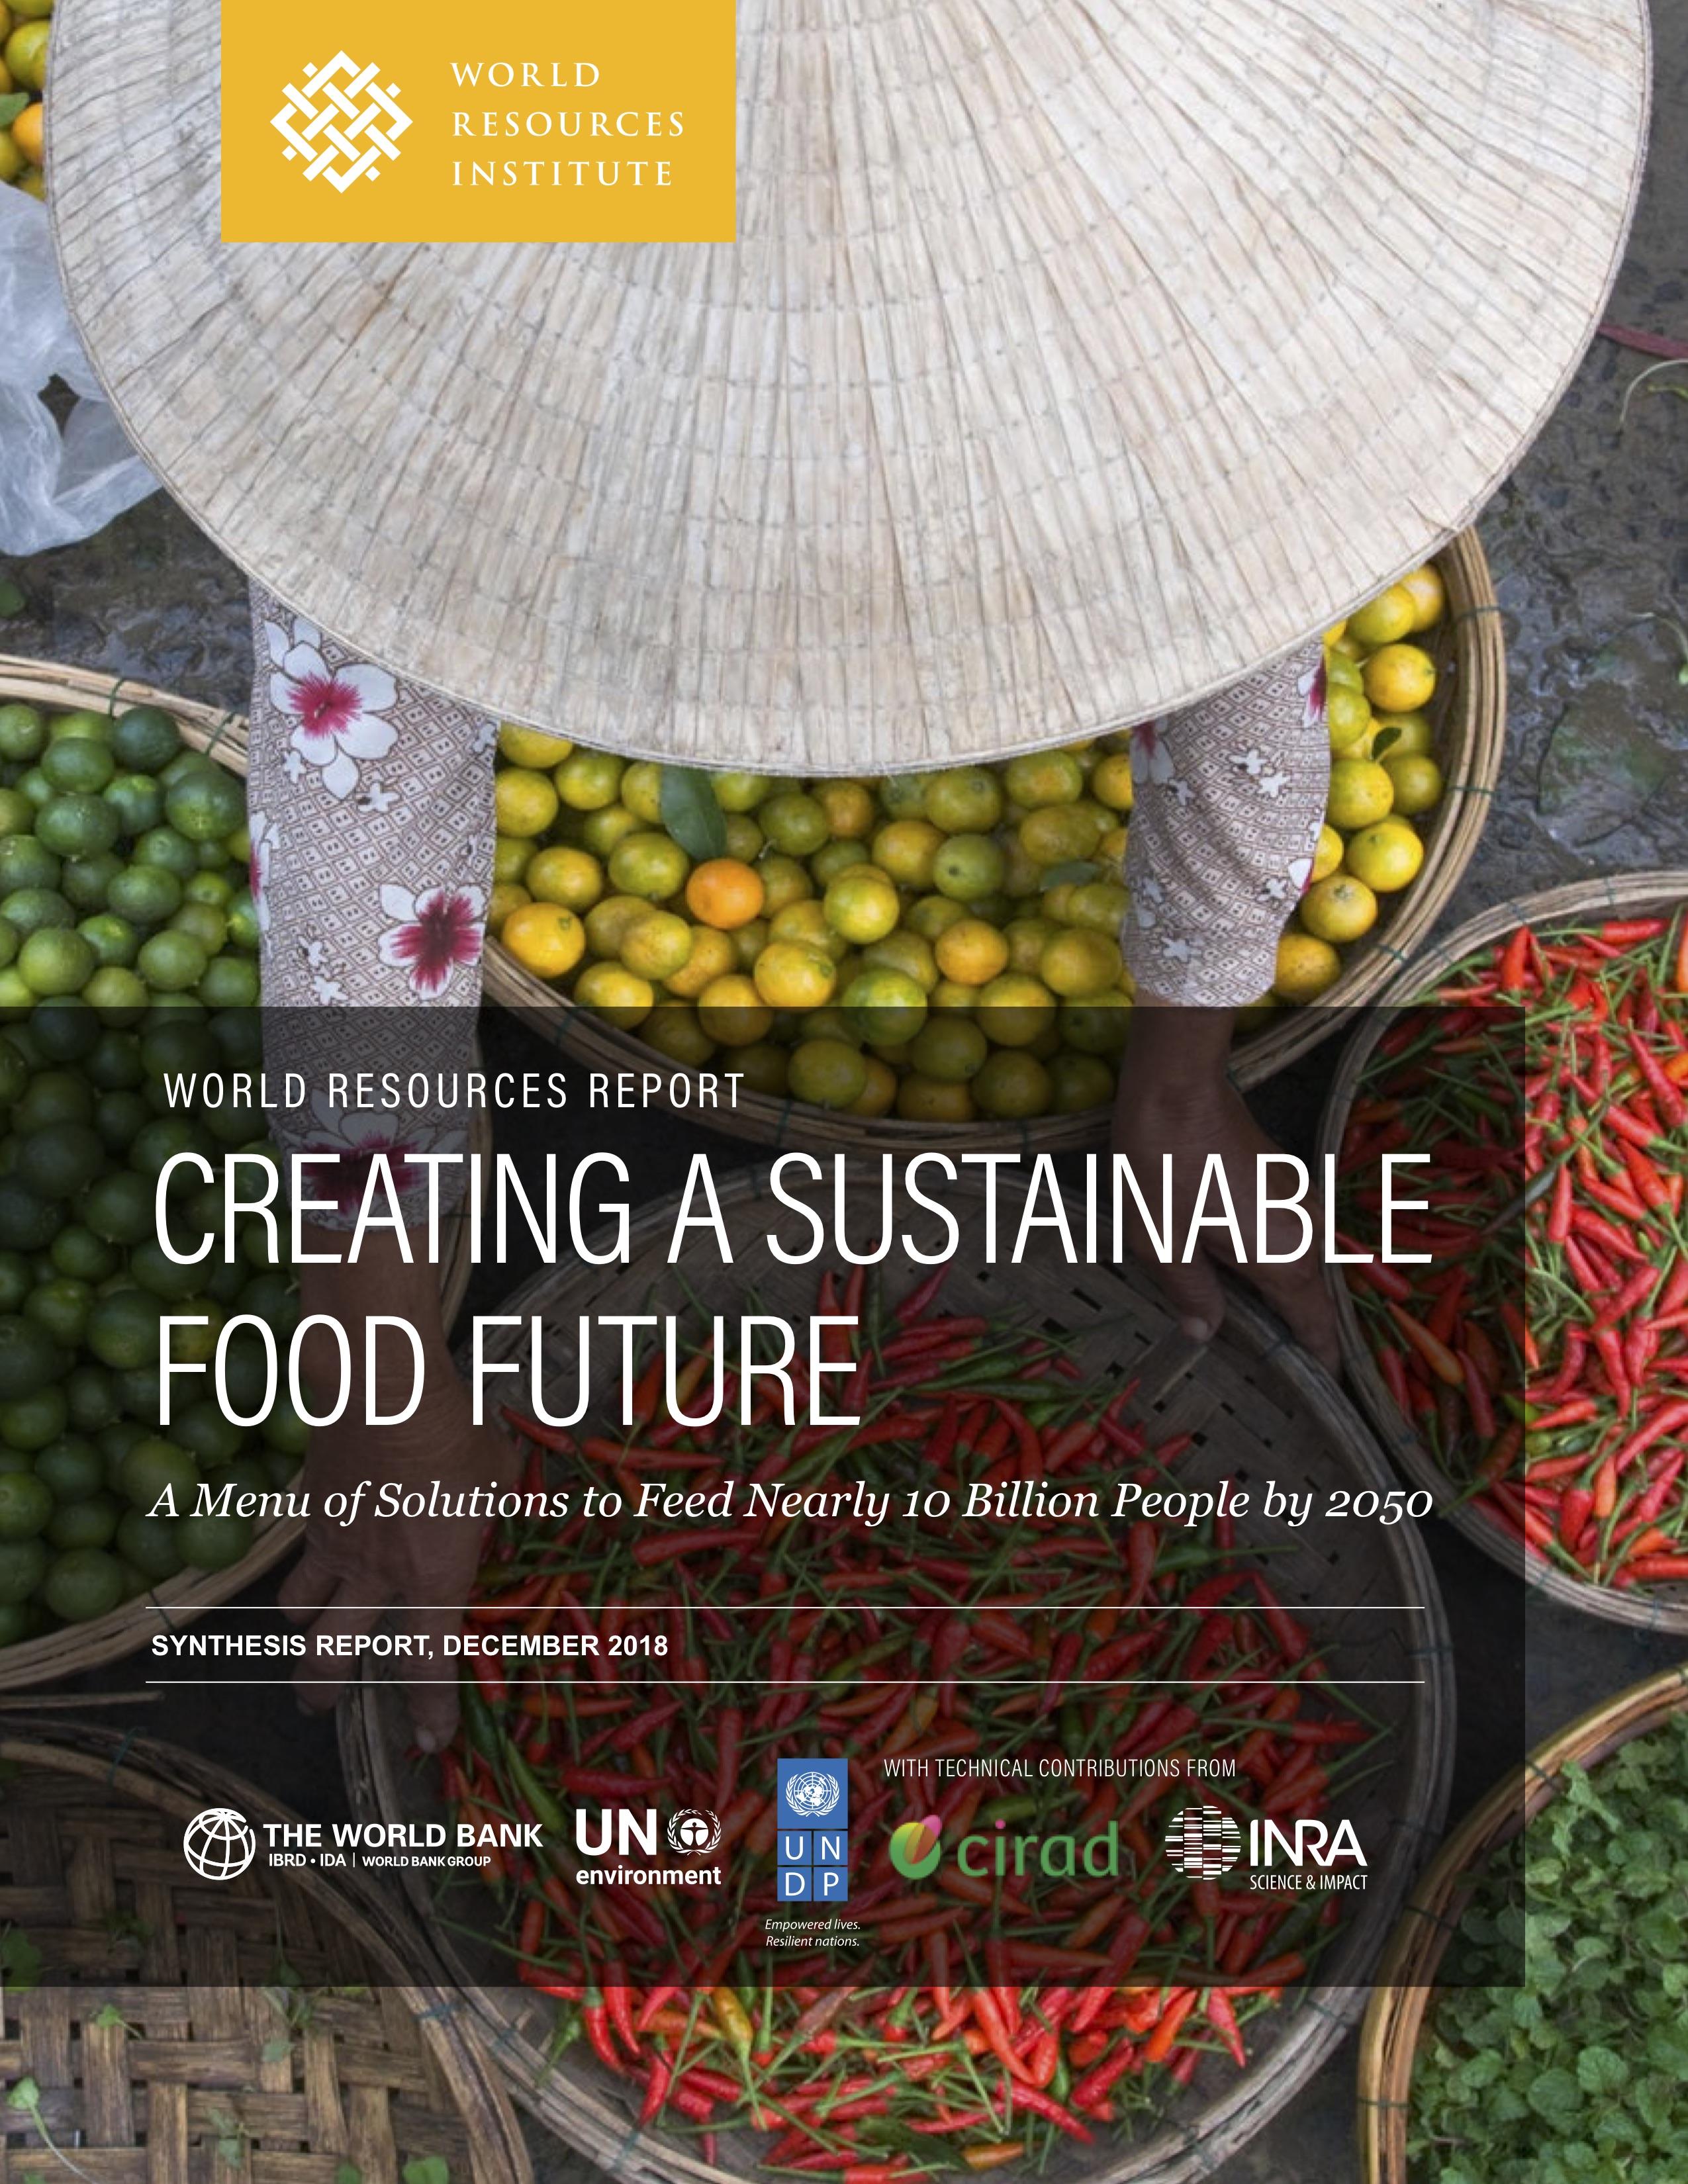 wri.org - Creating a Sustainable Food Future